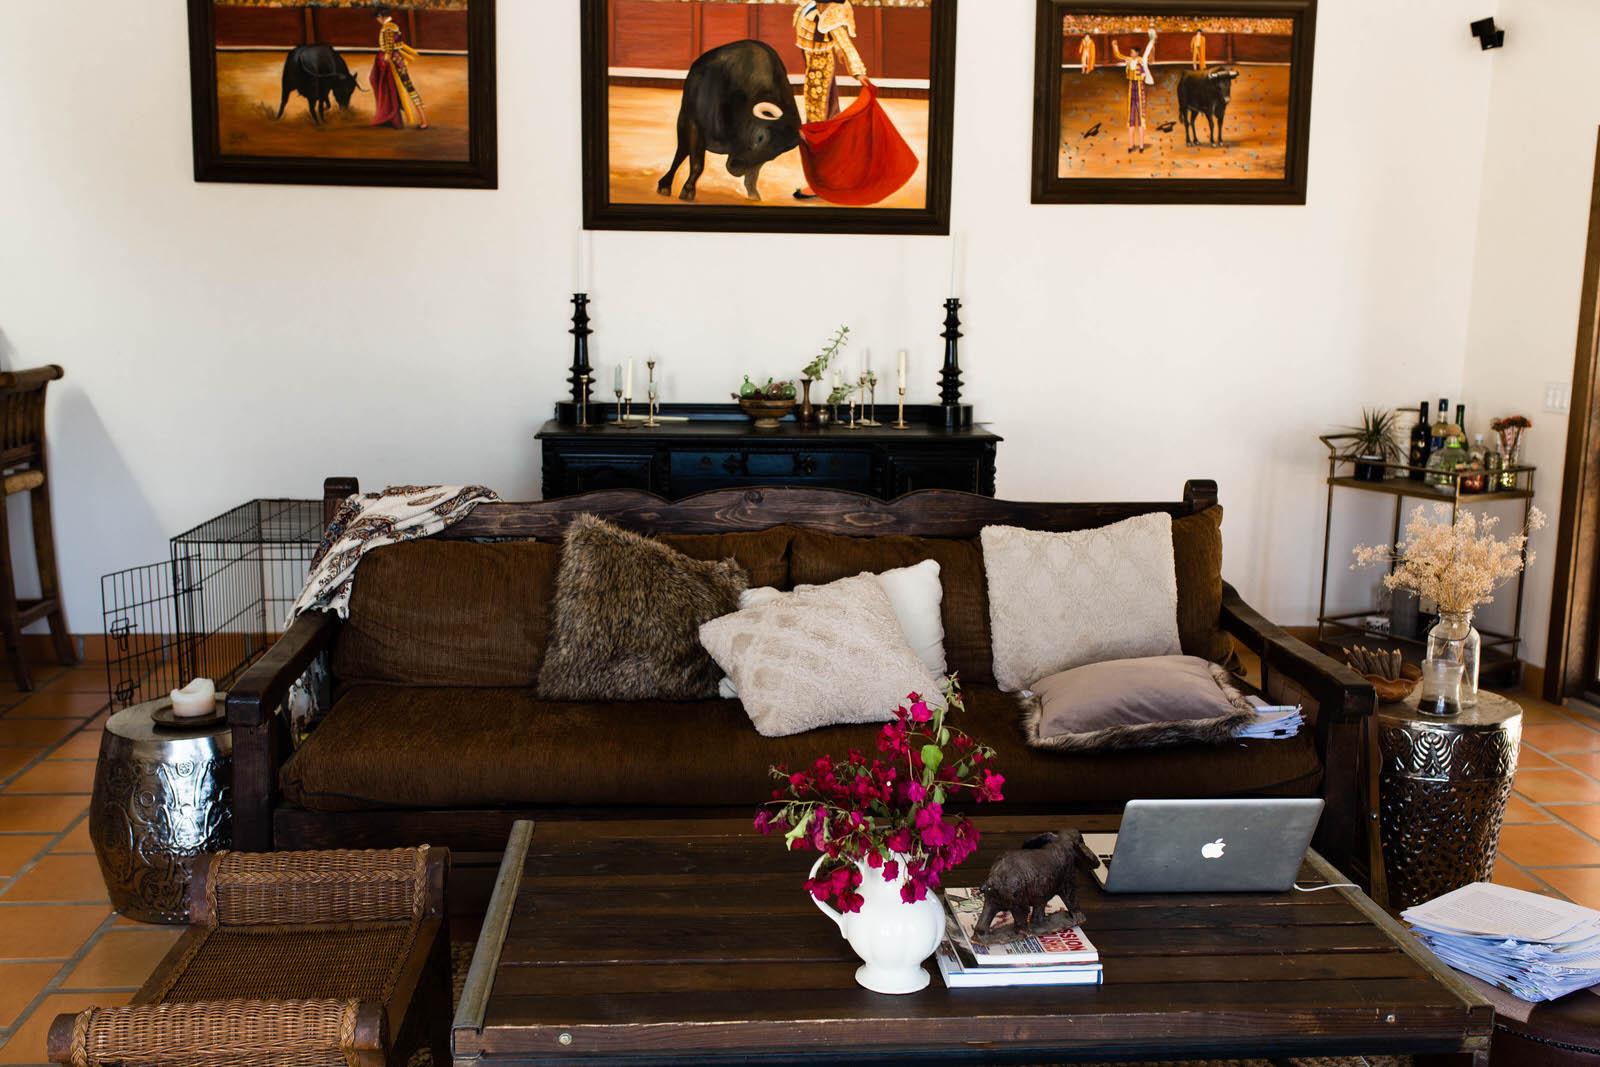 Spicy In Home Session |SamErica Studios